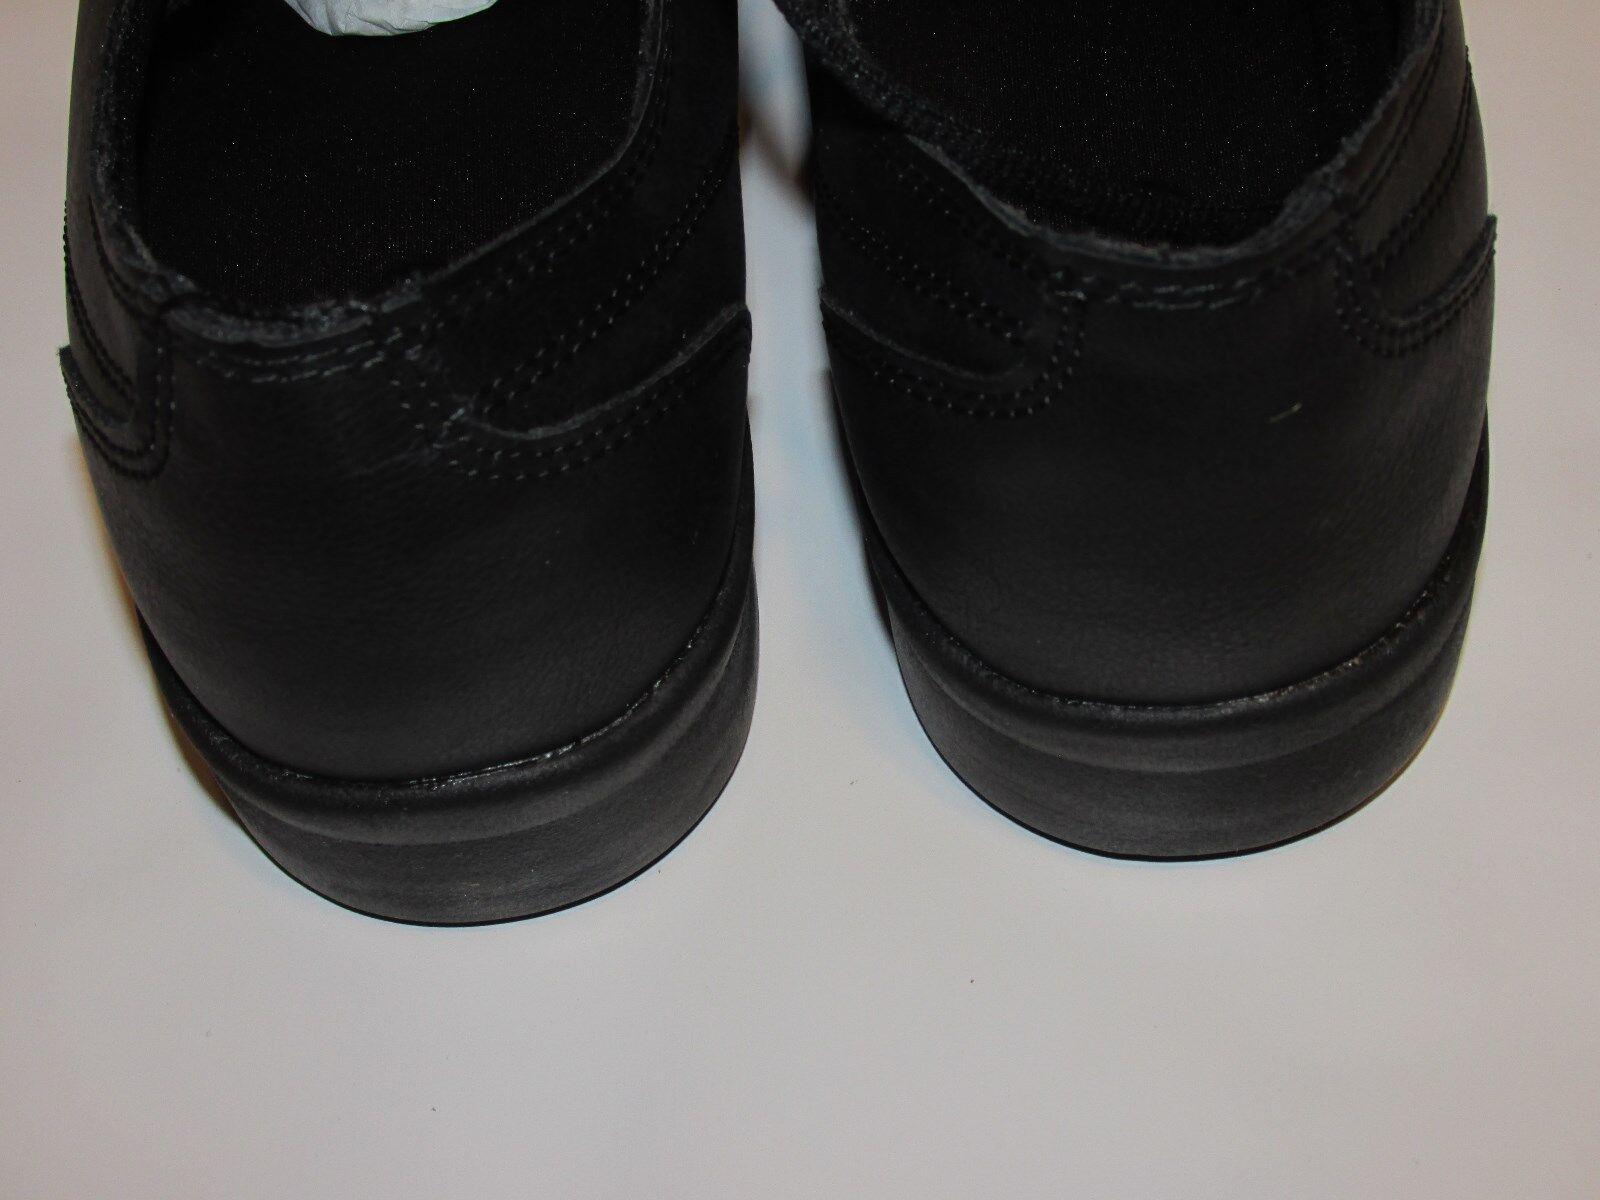 BRAND NEW IN BOX TROTSAFE  Schuhe WOMEN'S SLIP RESISTANT  Schuhe  ,SIZE : 9.5 72f097